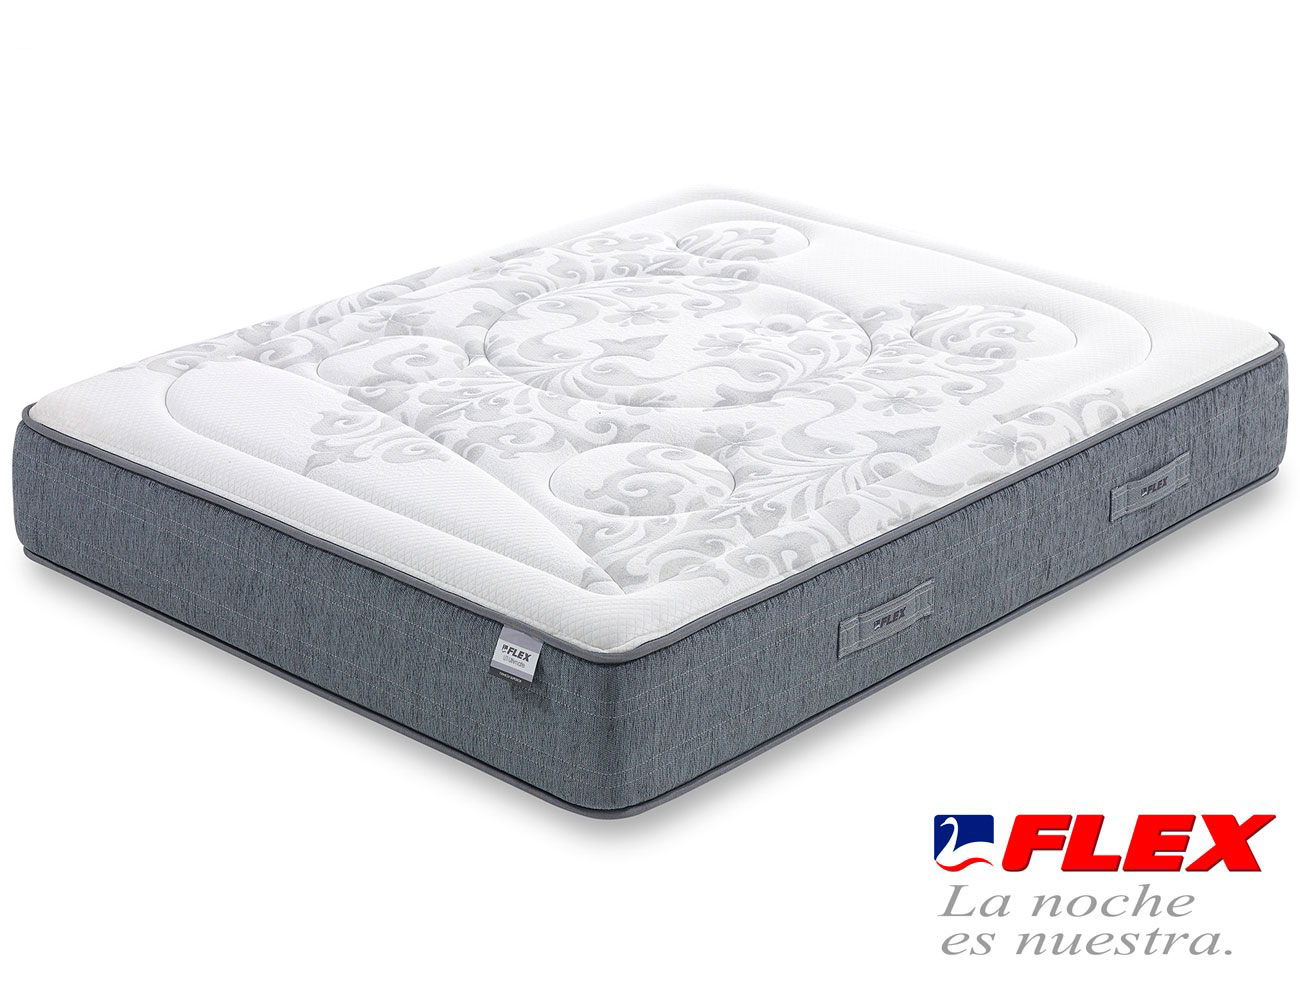 Colchon flex airvex viscoelastica gel garbi superior